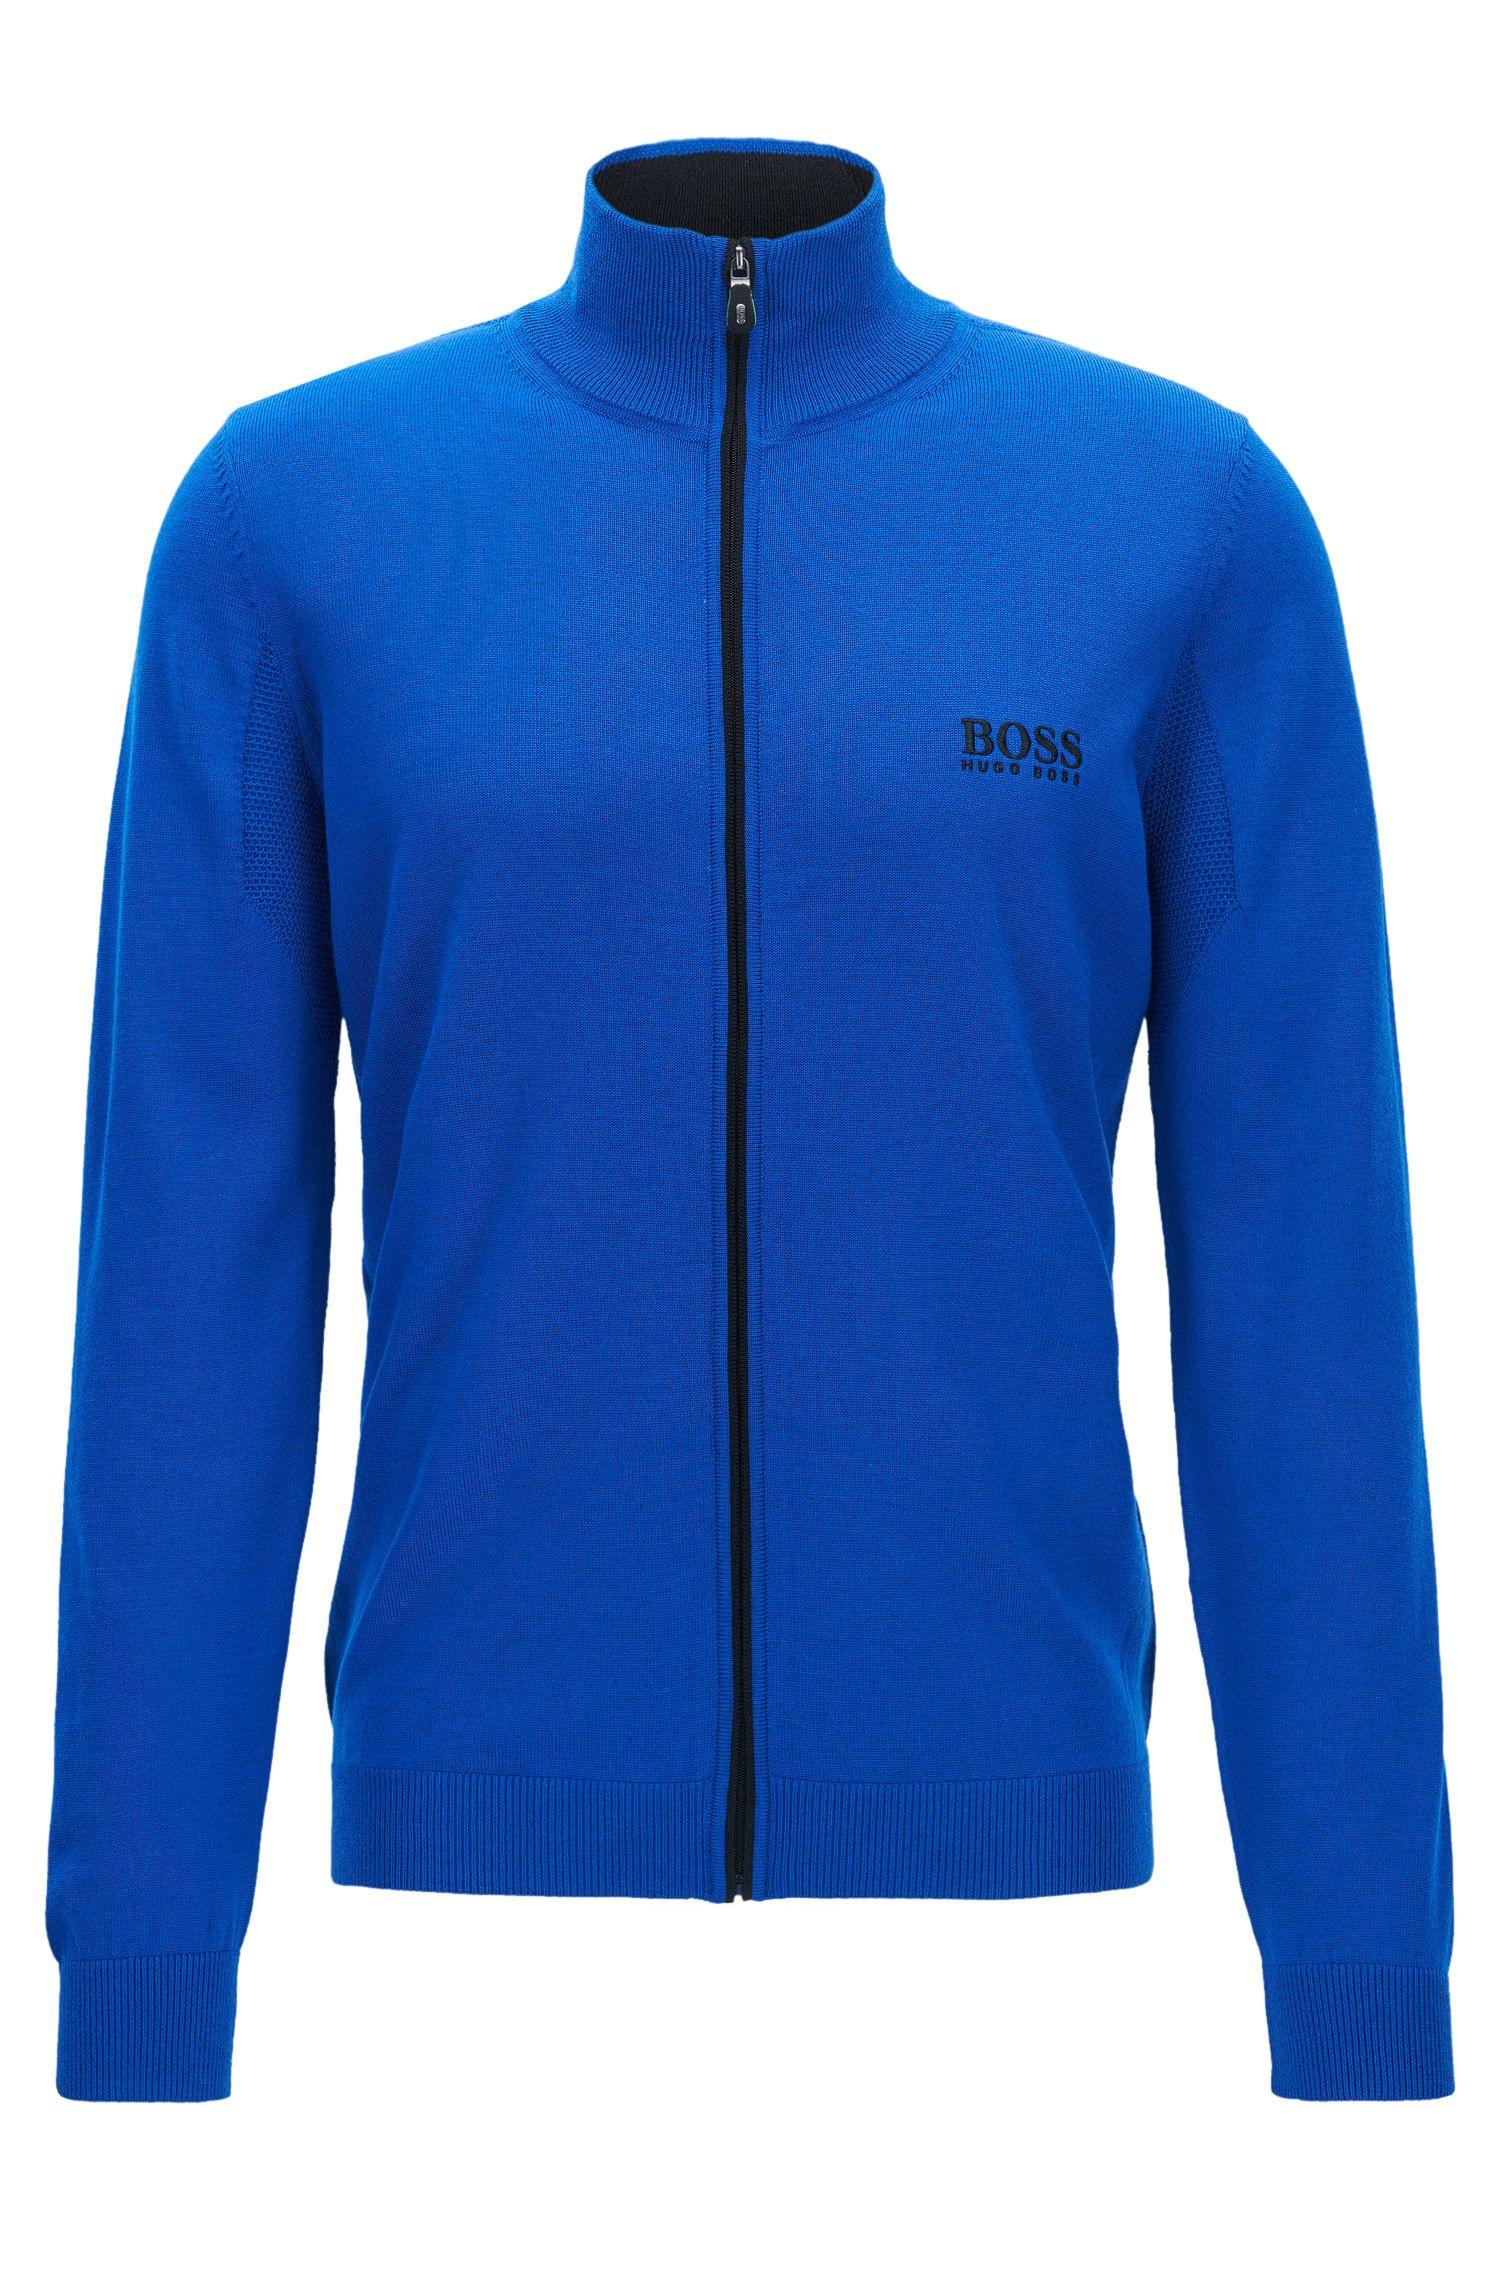 Virgin Wool Full-Zip Sweater Jacket   Zeen Pro